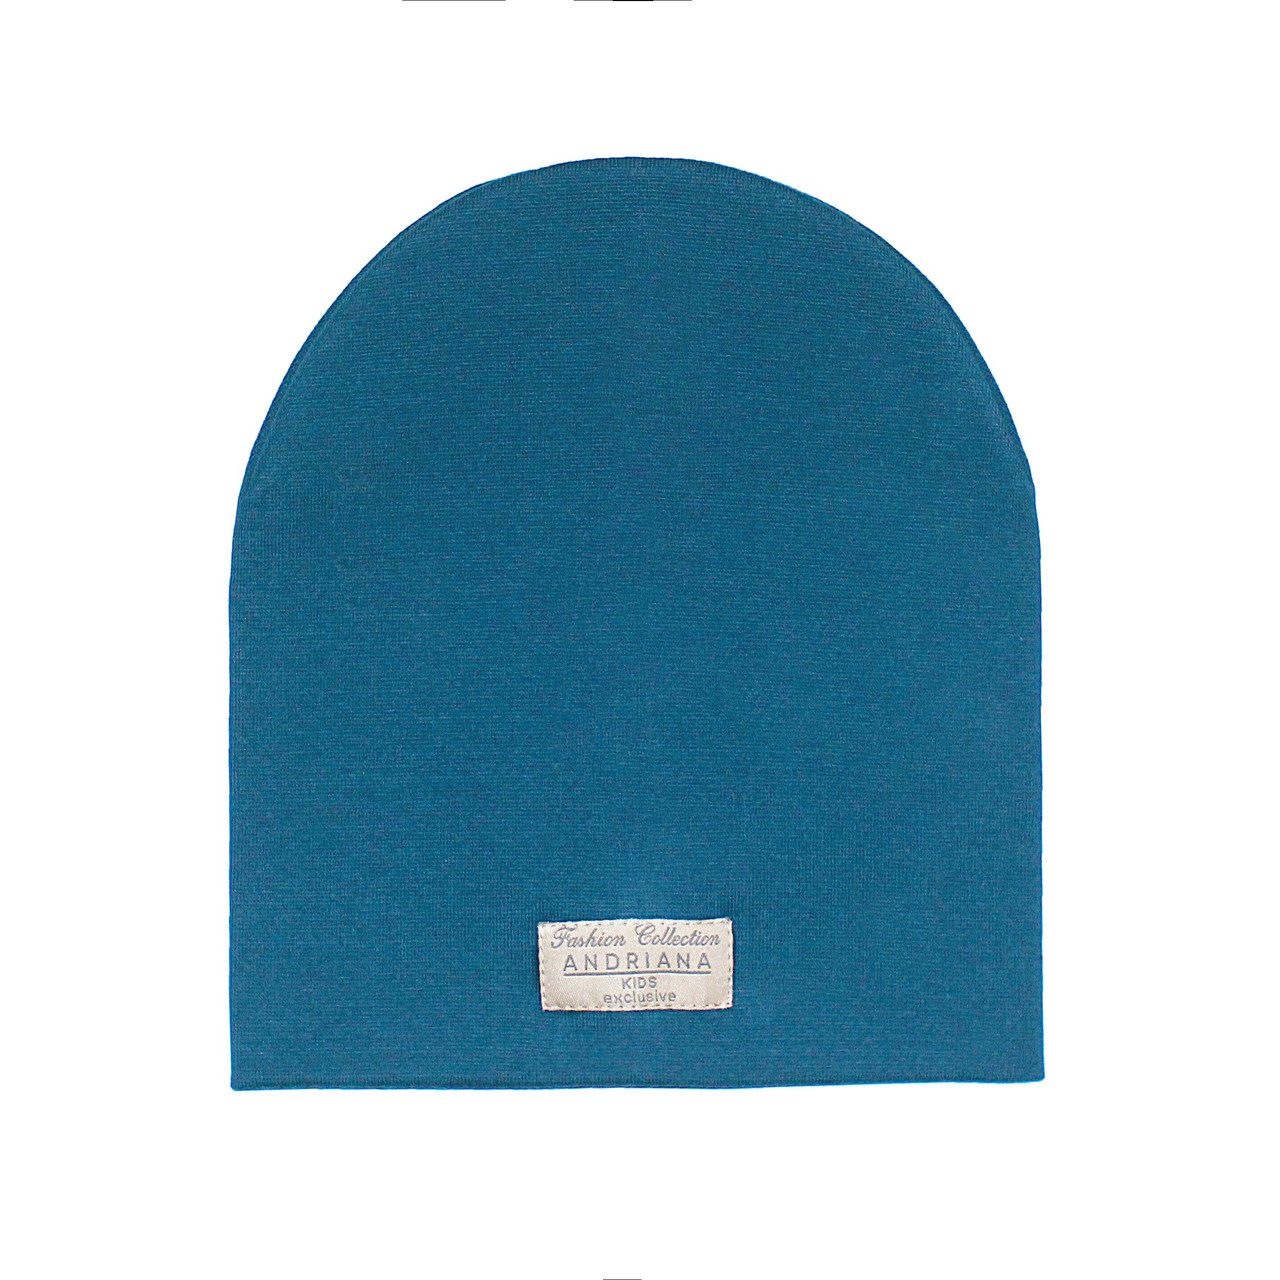 Двойная шапочка 44-46,48-50,52-54 см. Andriana Kids синяя